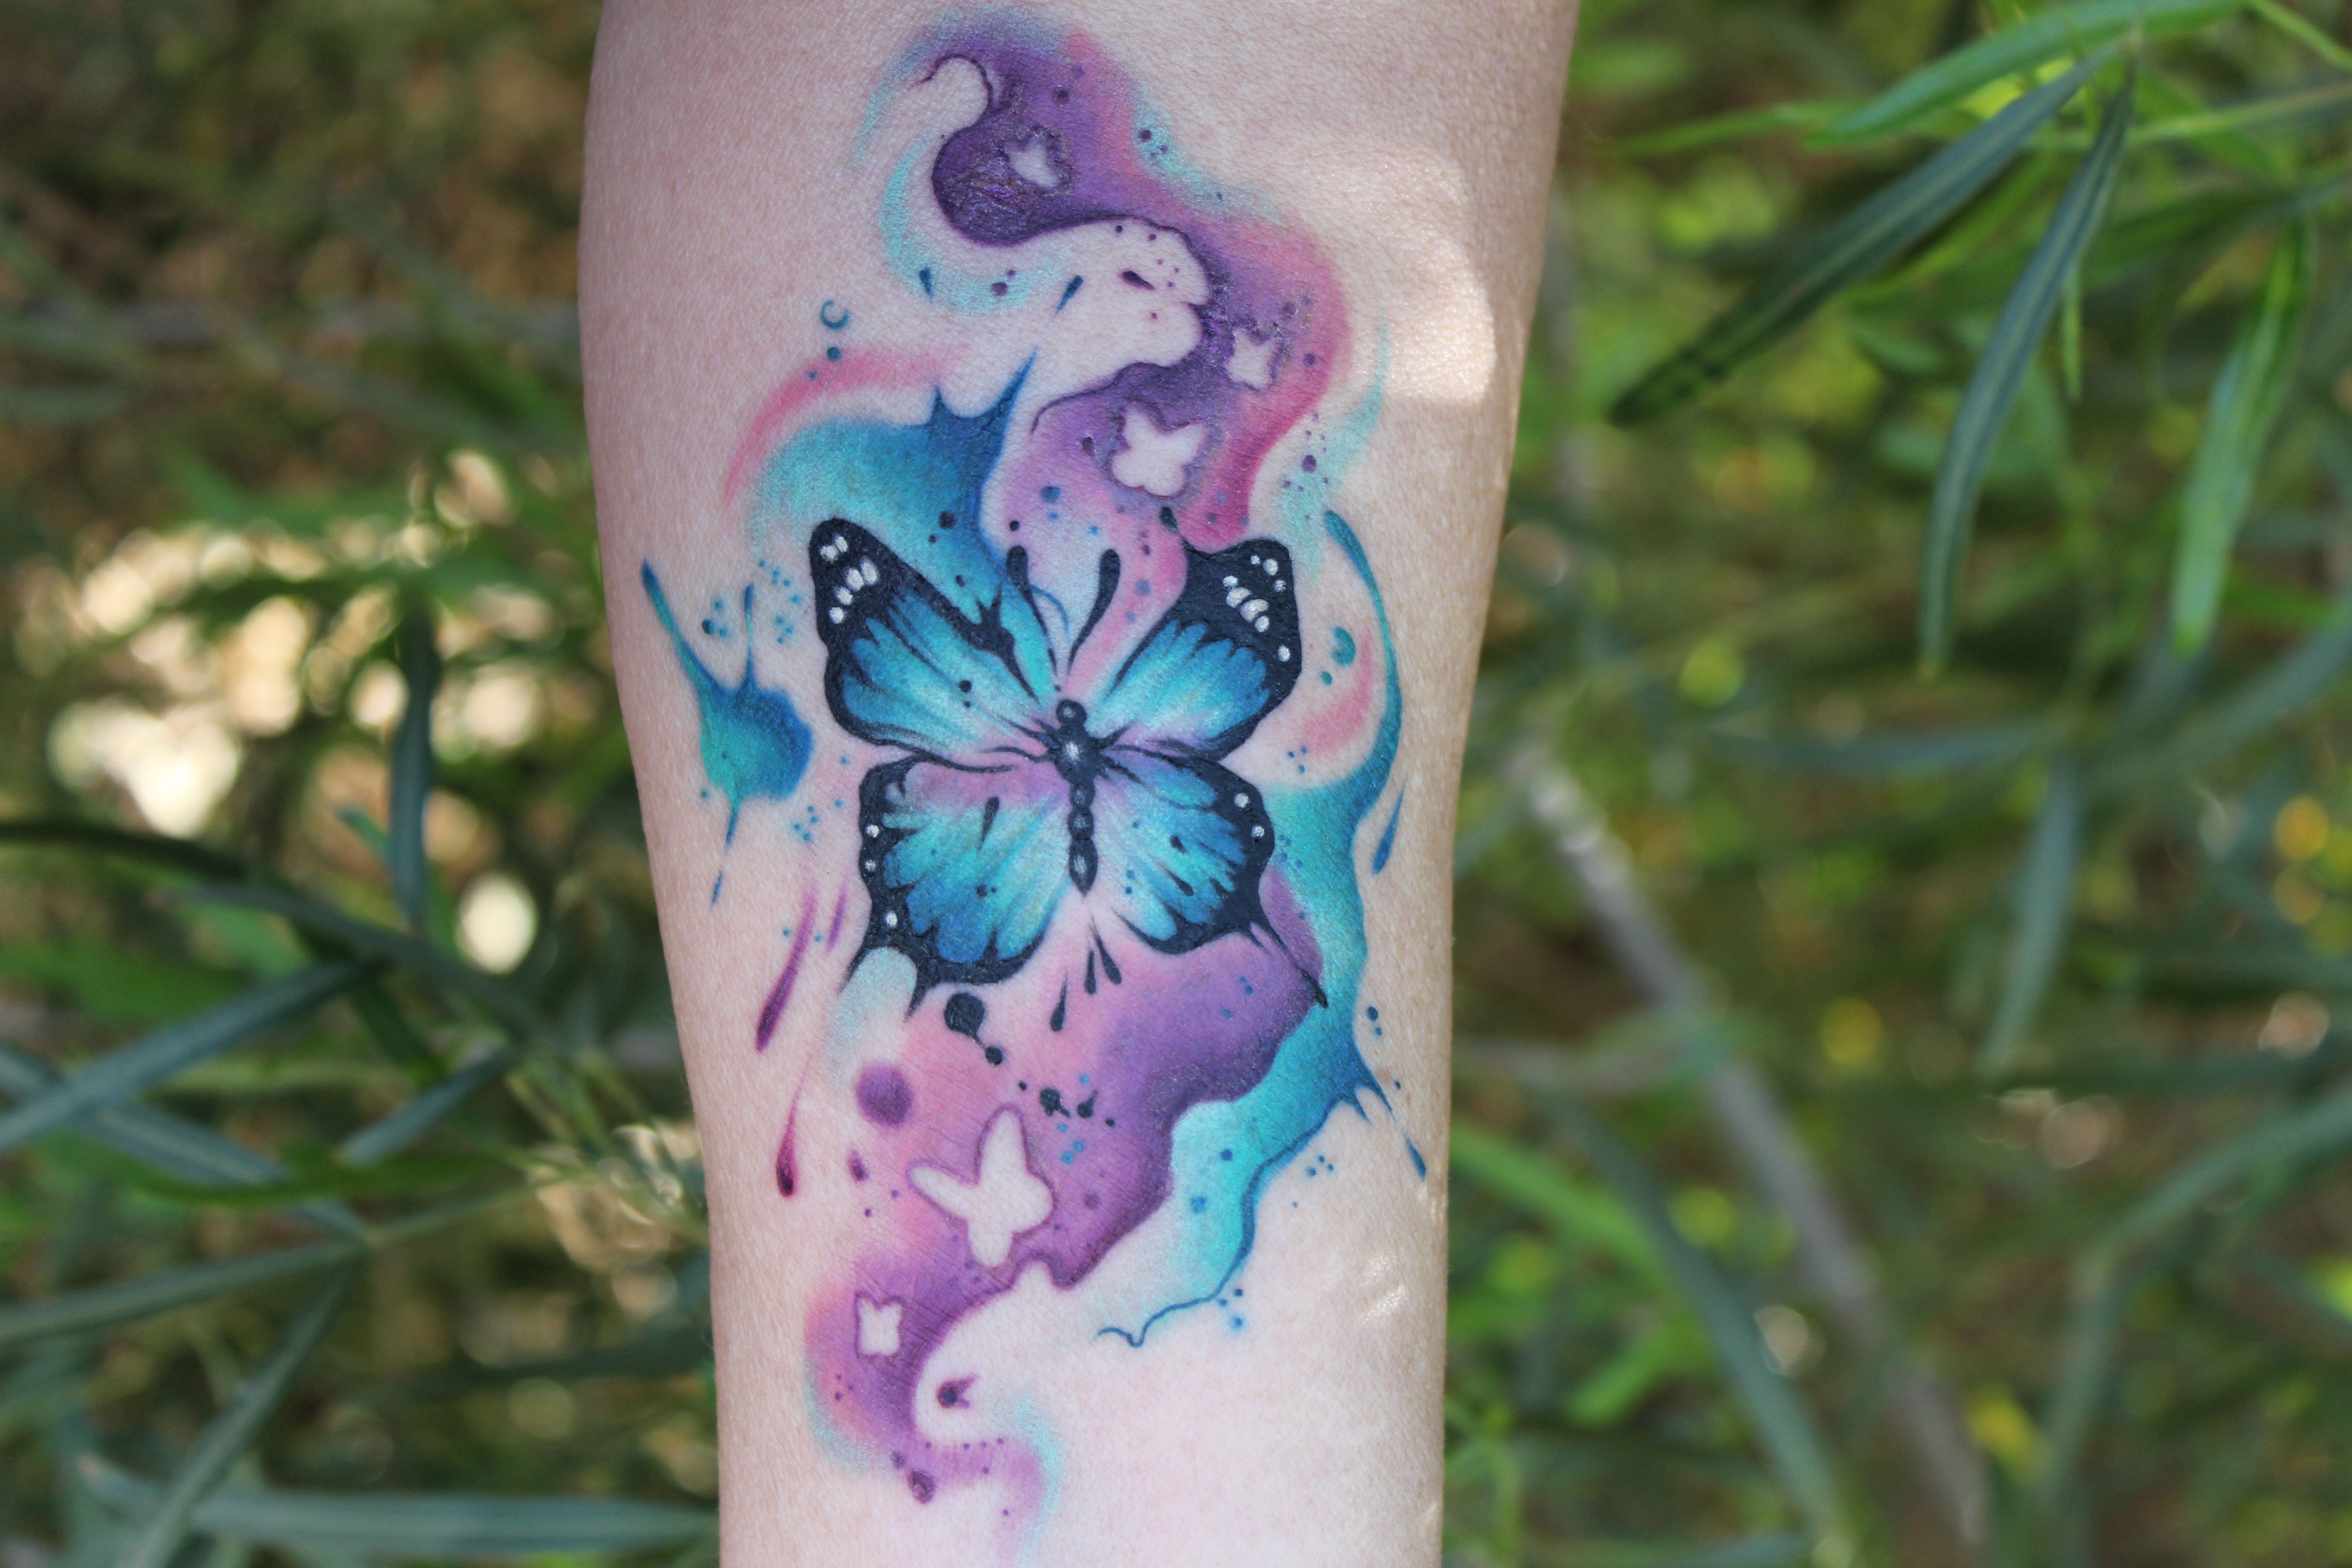 Thanks Again Cheryl Fun Watercolor Butterfly Butterflytattoo Semicolontattoo Watercolortattoo Customt Butterfly Tattoo Butterfly Watercolor Custom Tattoo